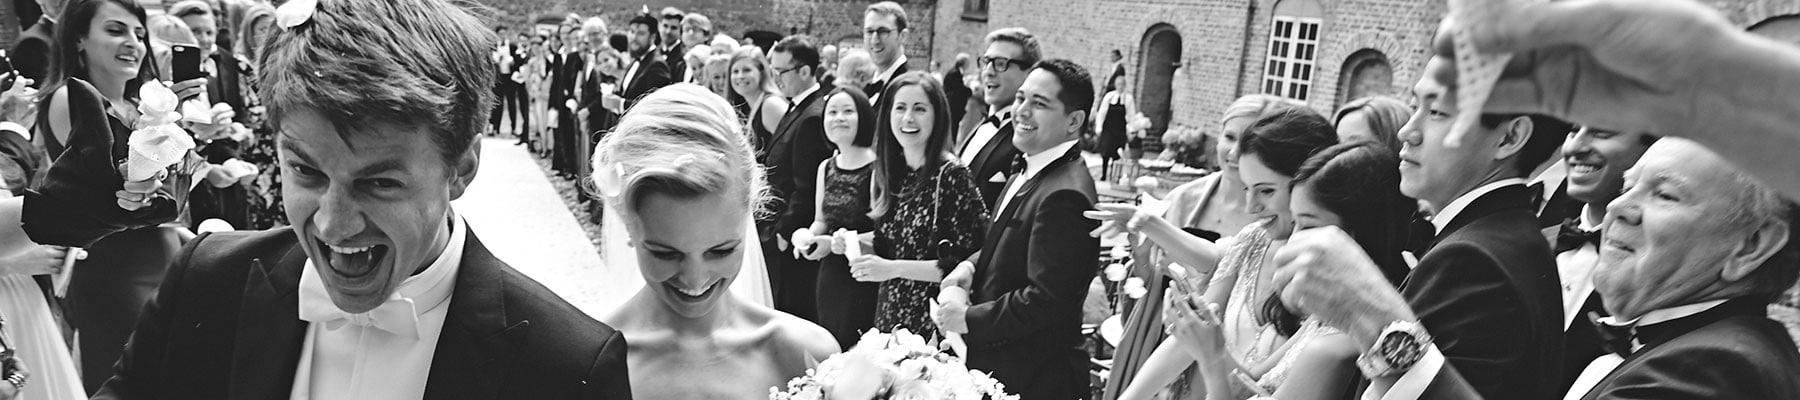 Bryllup på fyn - brudgommen og bruden